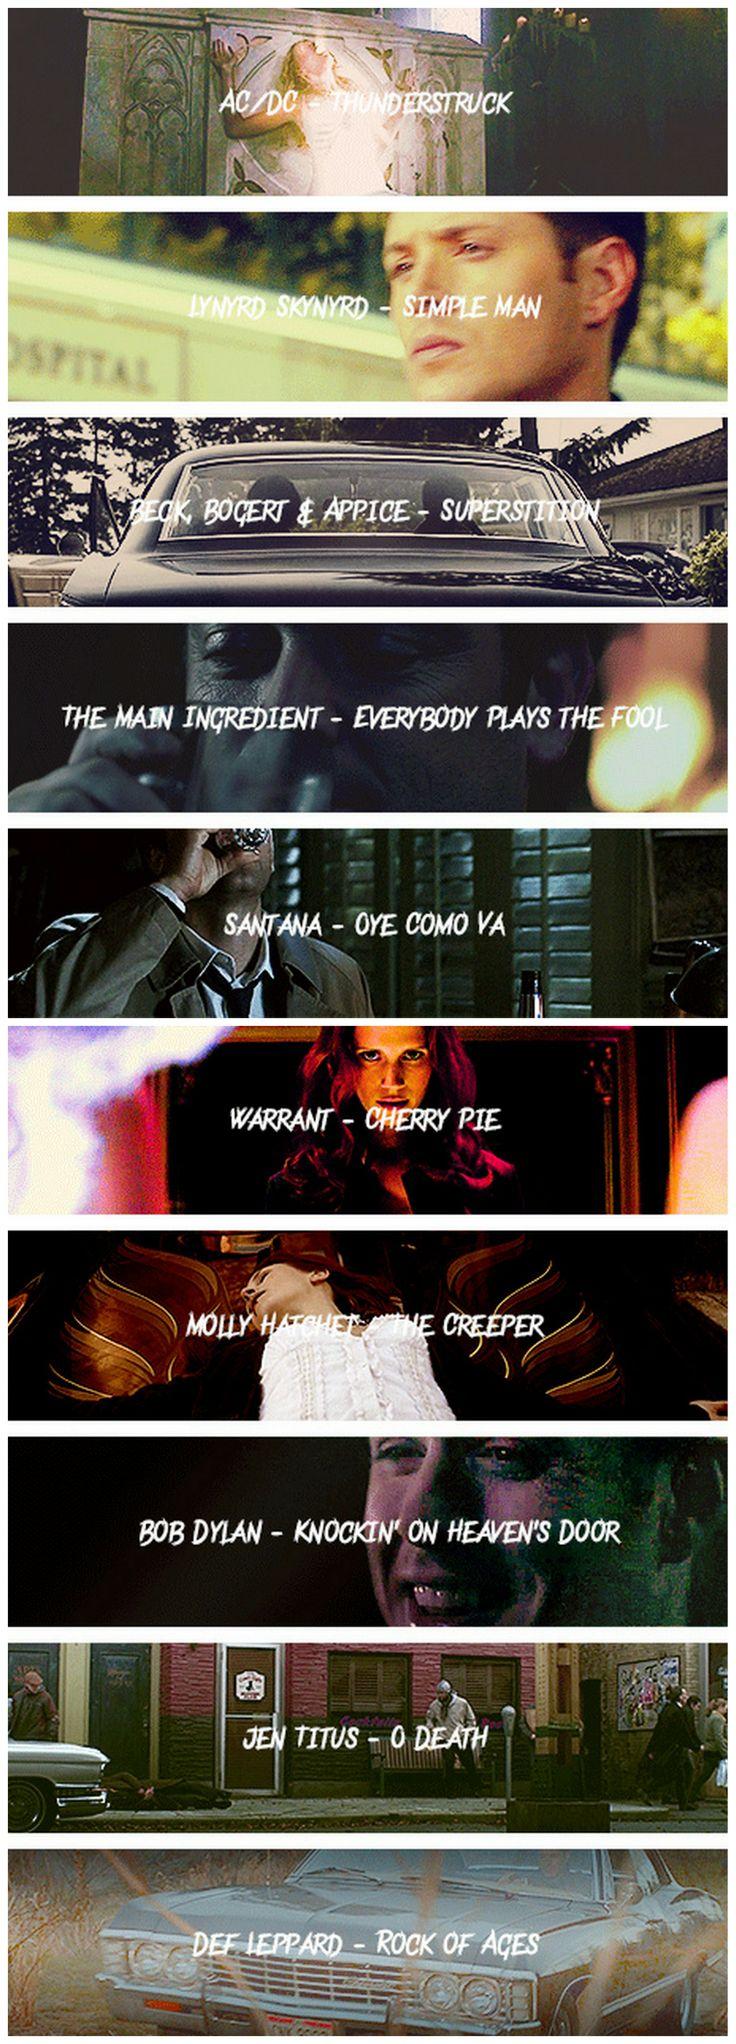 [gifset] Supernatural soundtrack season 5